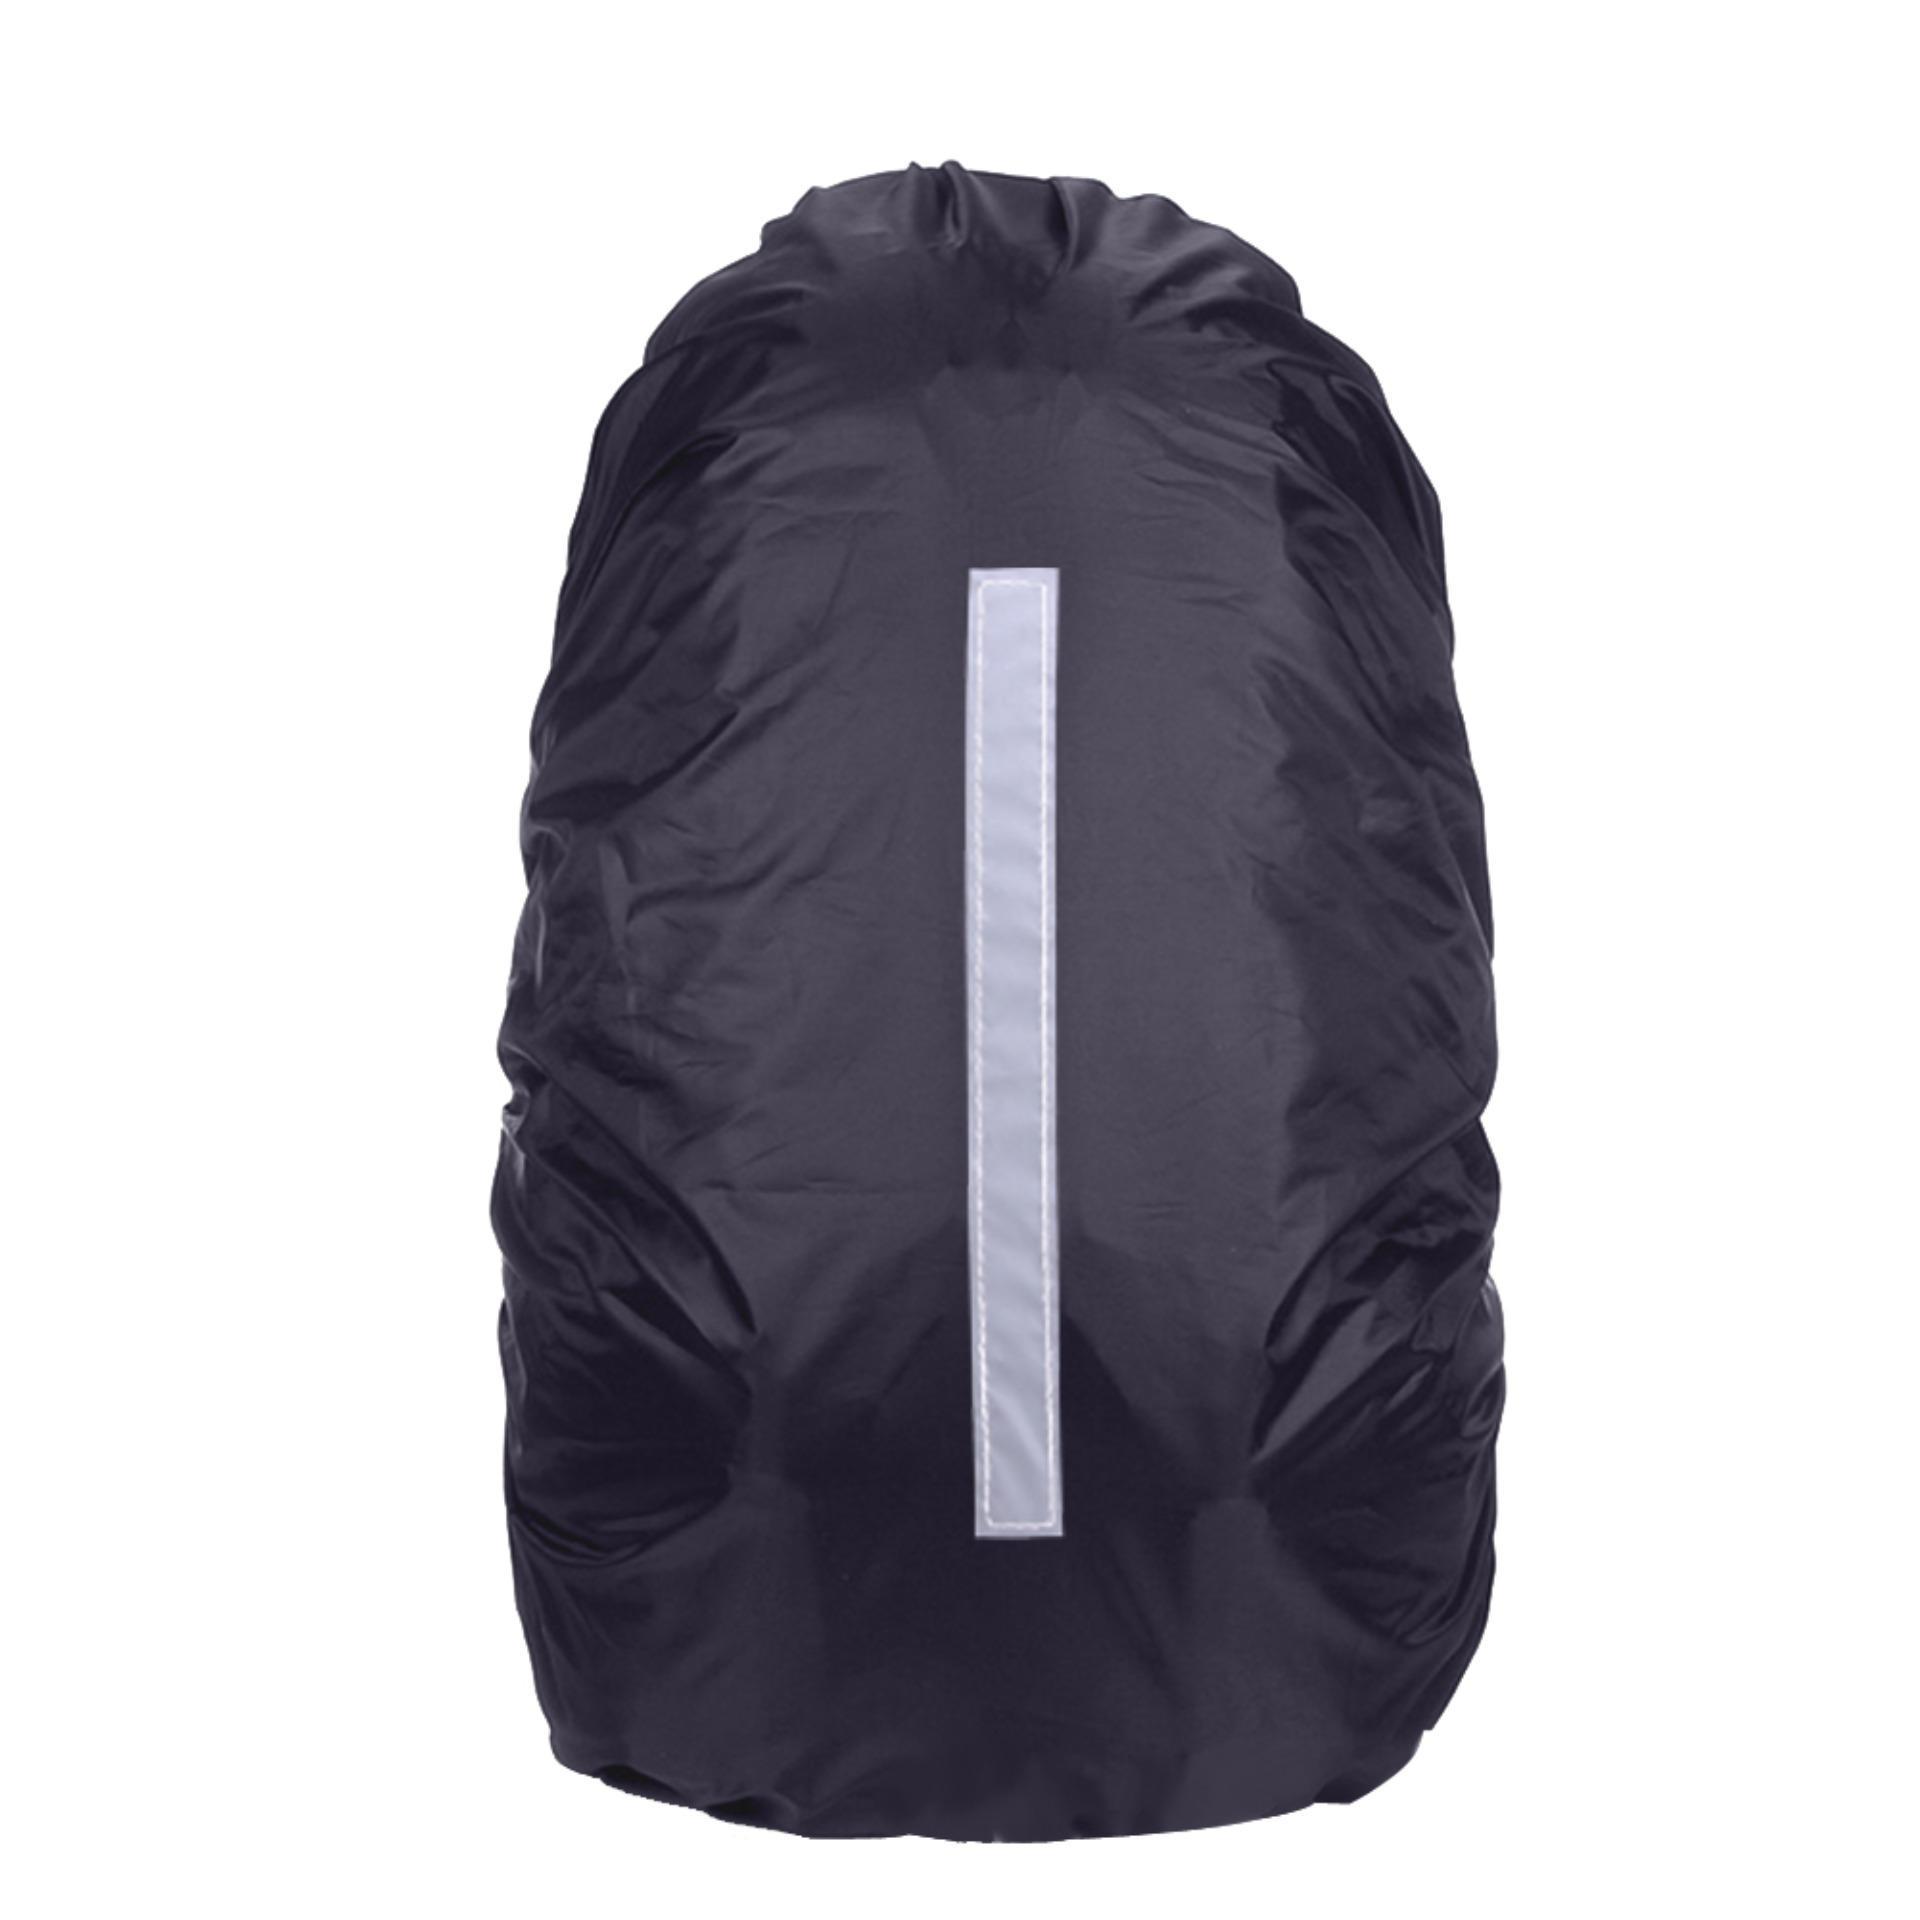 5b0466de43e8 Reflective Waterproof Rain Dust Backpack Bag Cover Safety Travel - intl